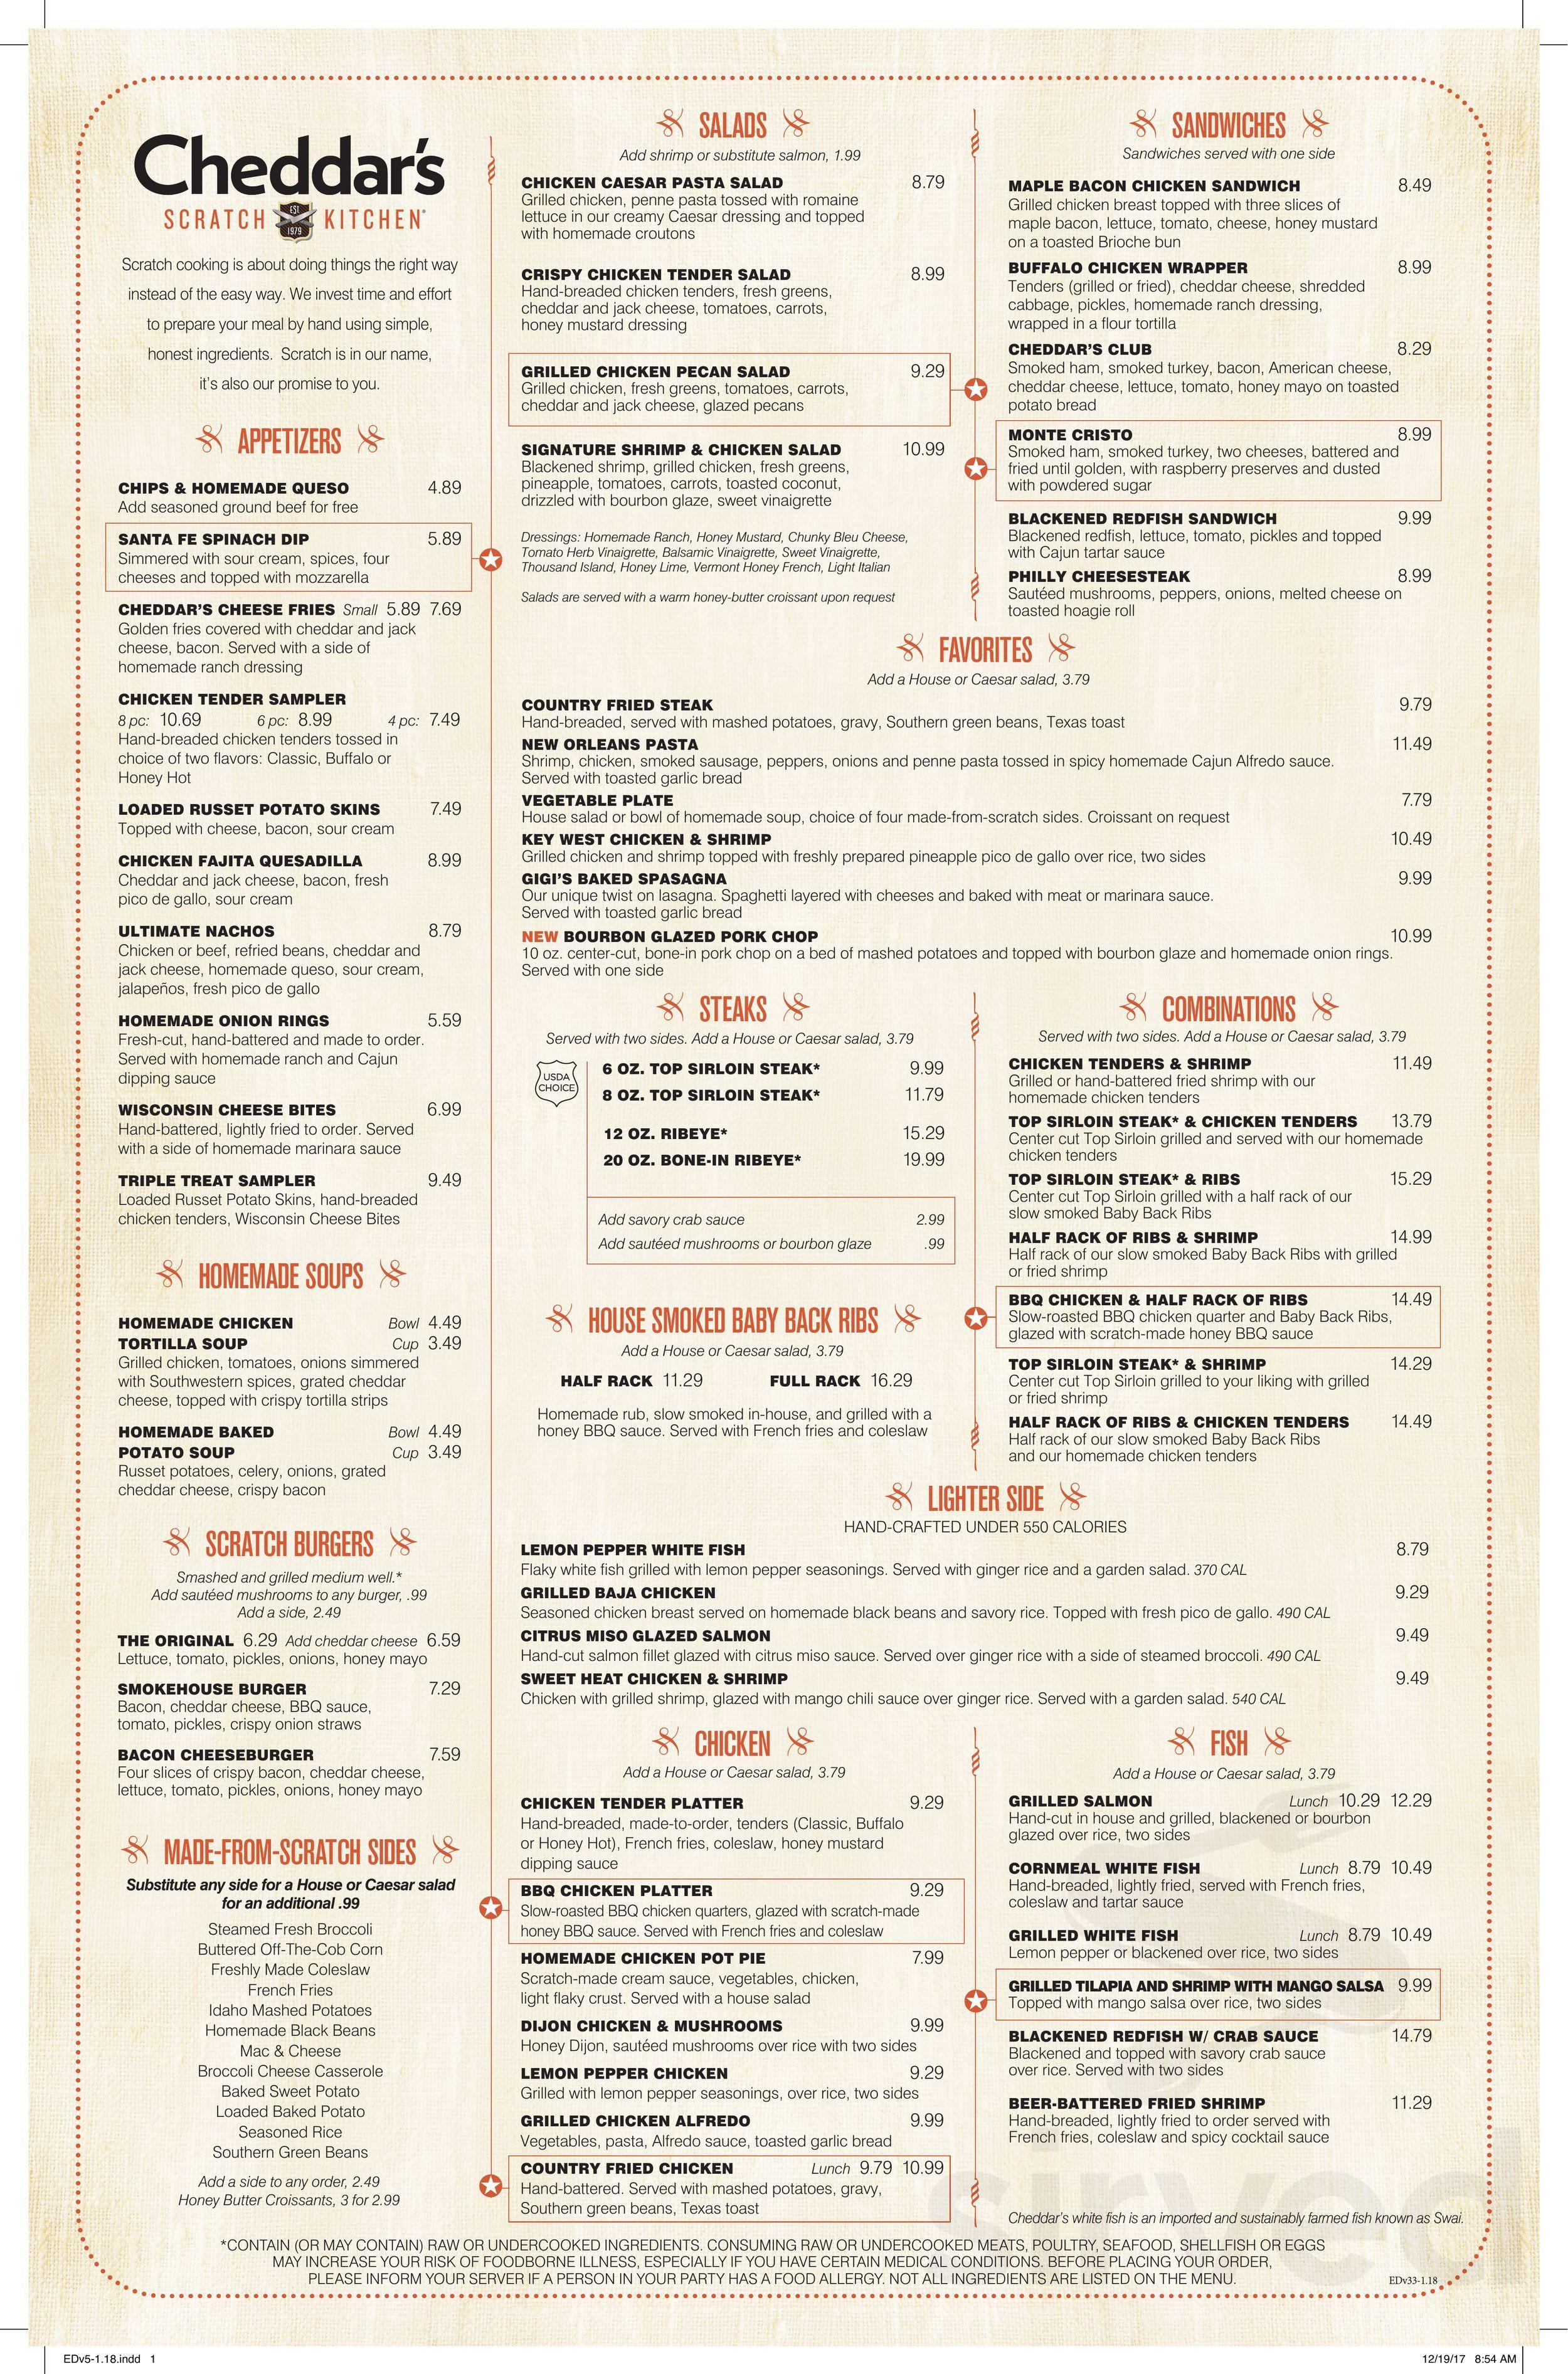 Cheddar S Scratch Kitchen Menu In Bloomington Indiana Usa